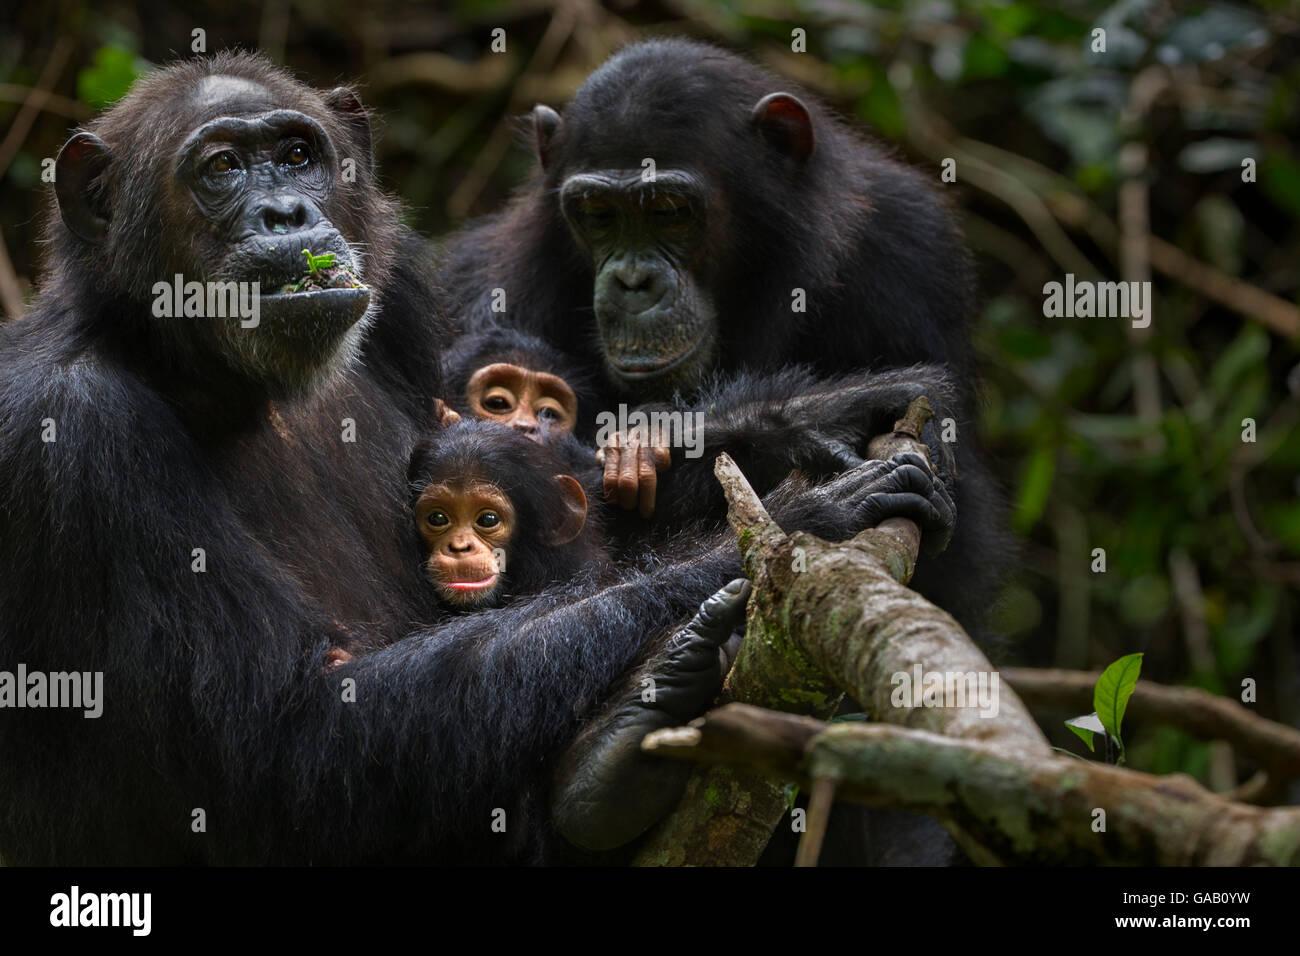 Eastern chimpanzee (Pan troglodytes schweinfurtheii) female 'Gremlin' aged 40 years holding her daughter - Stock Image